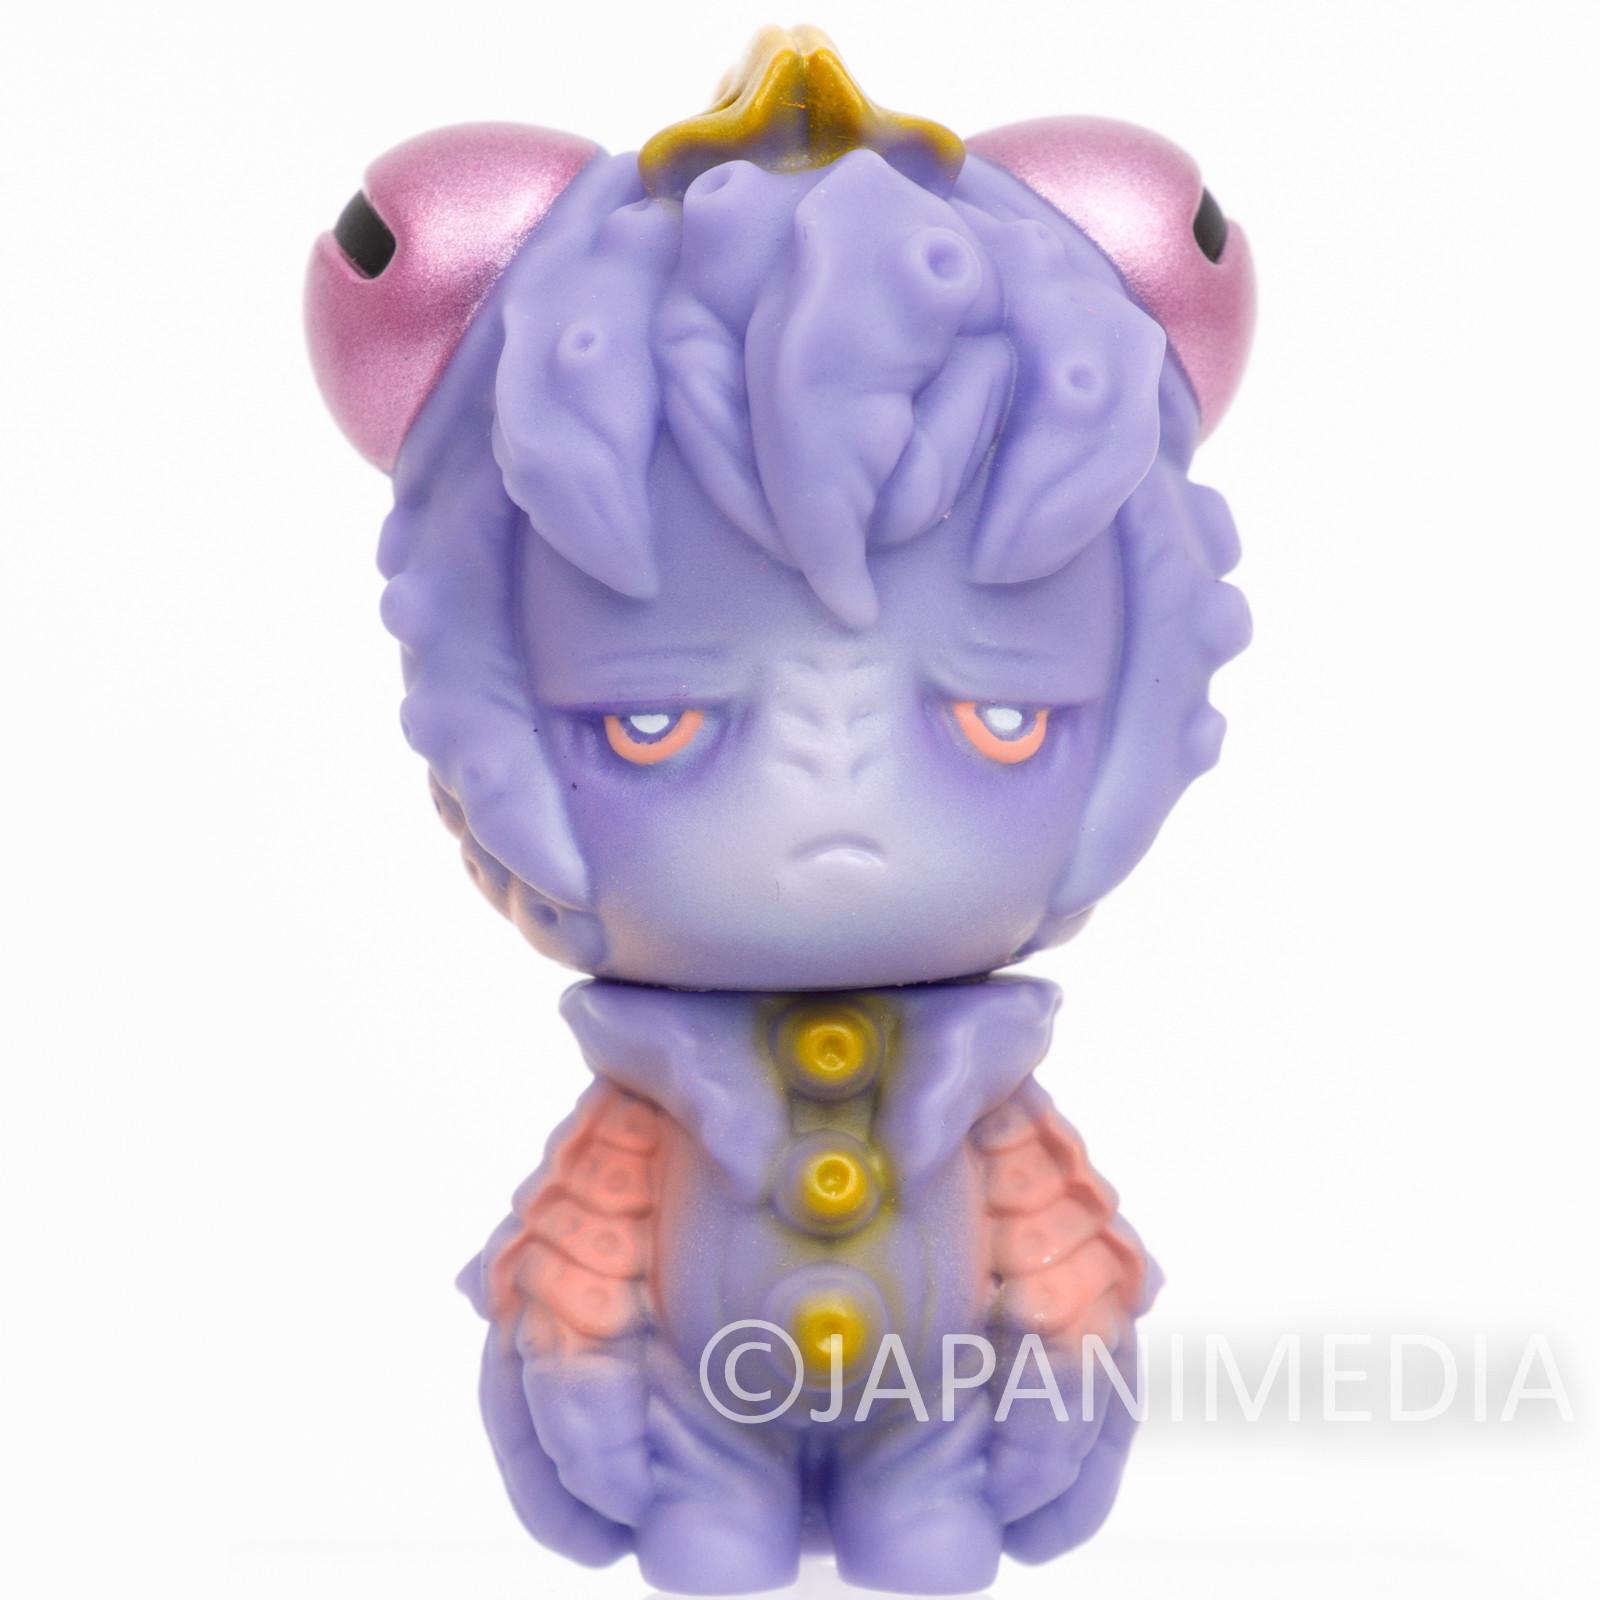 Gniulhu Soft Vinyl Figure Medicom Toy VAG Series JAPAN